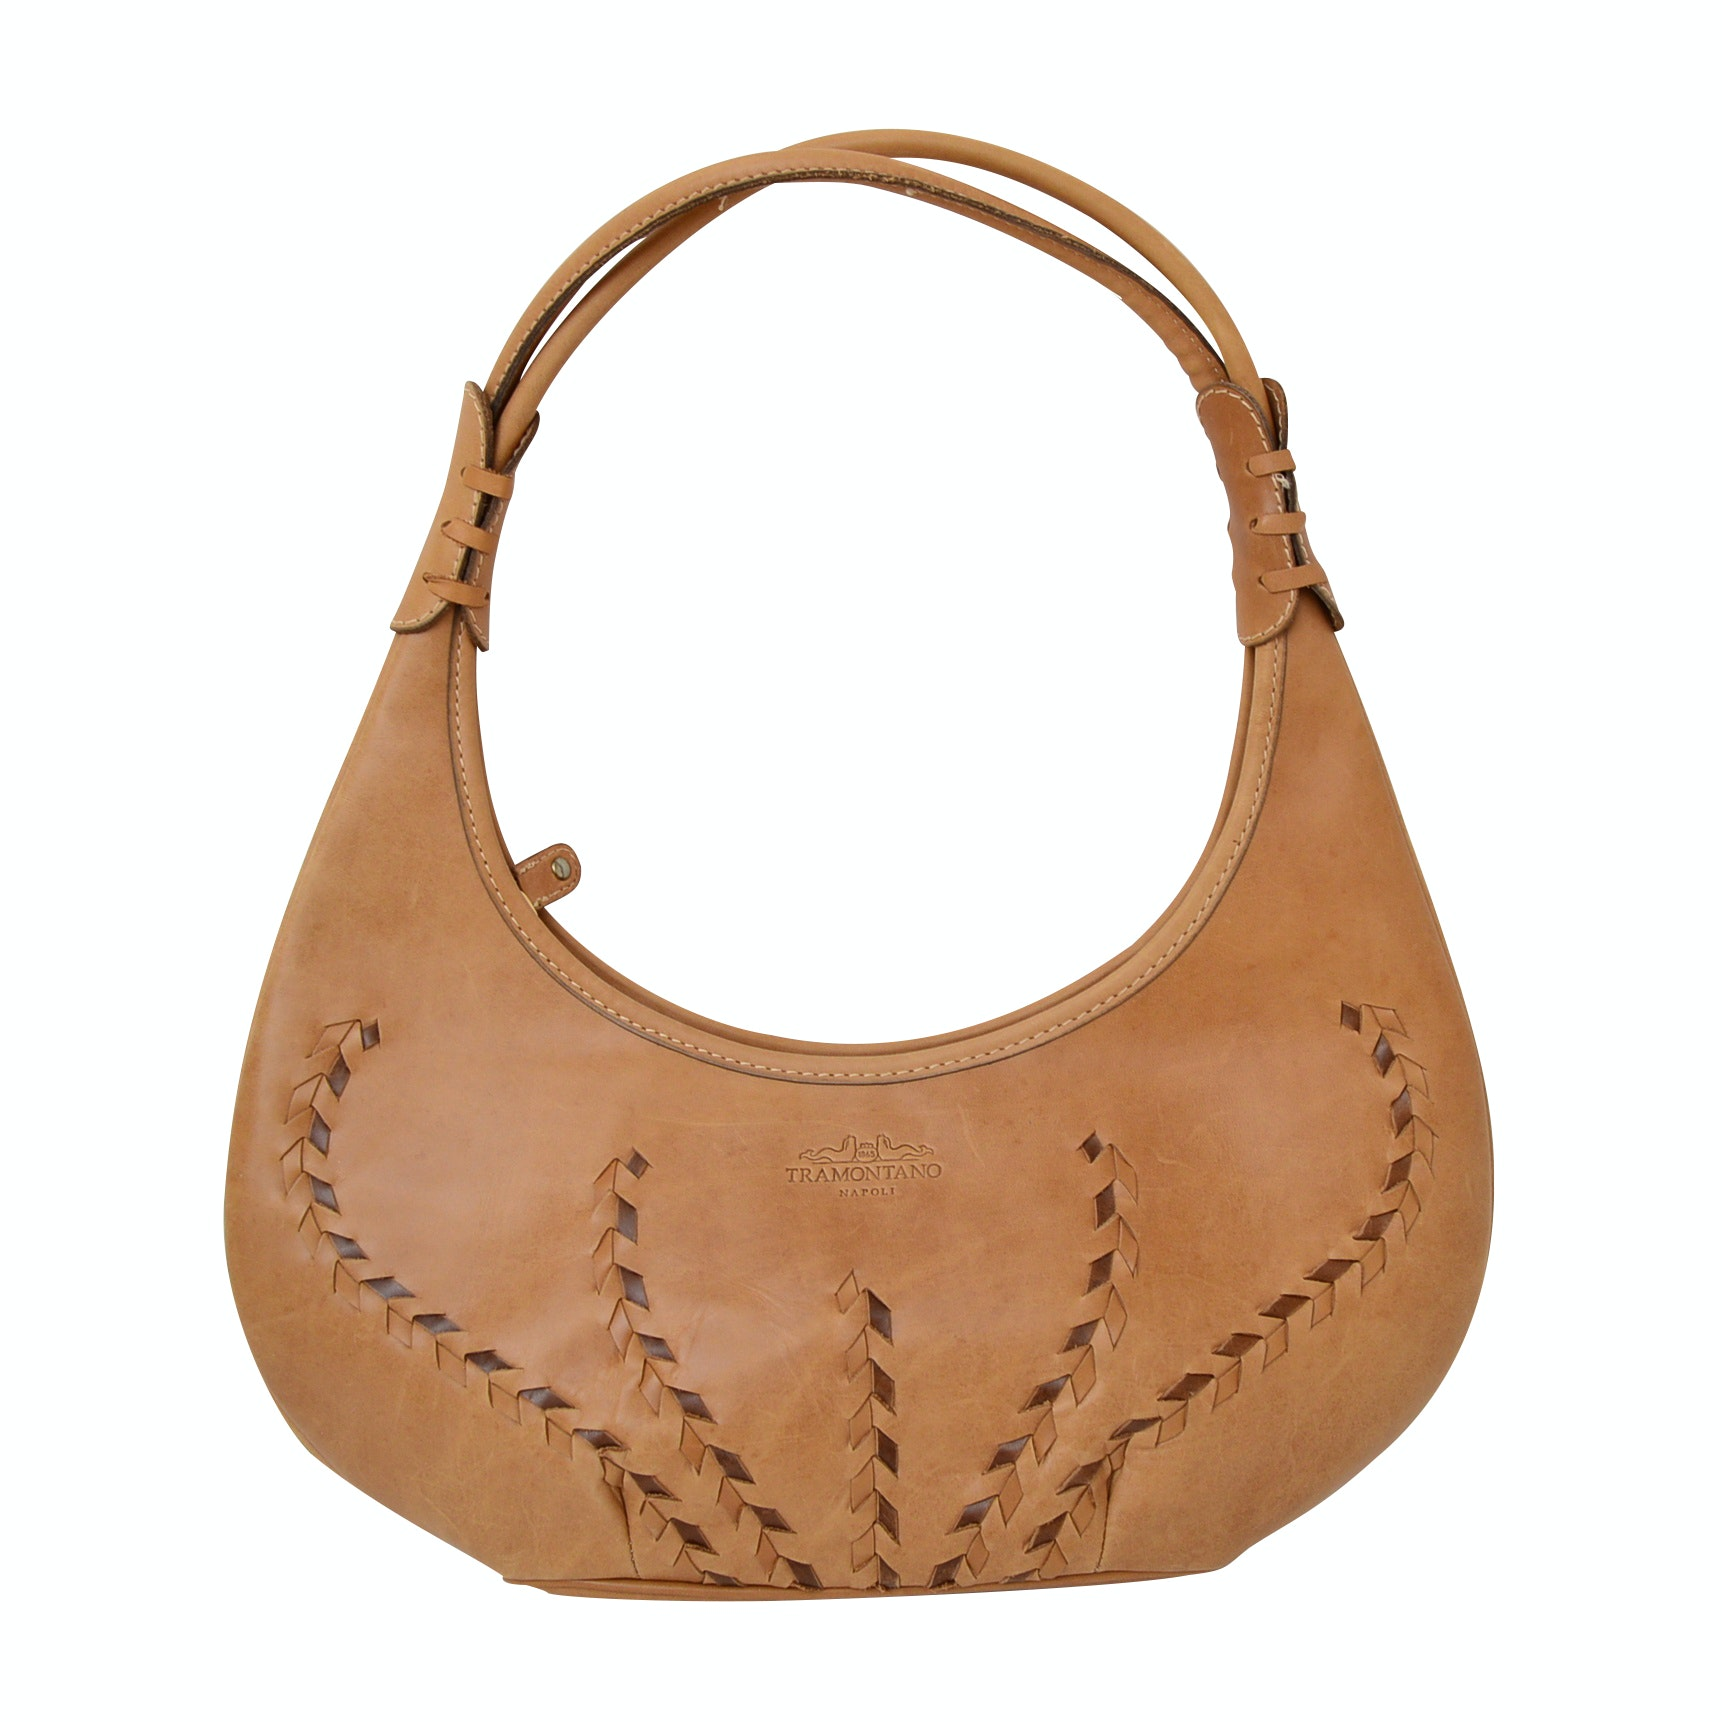 Tramontano Spa Leather Handbag